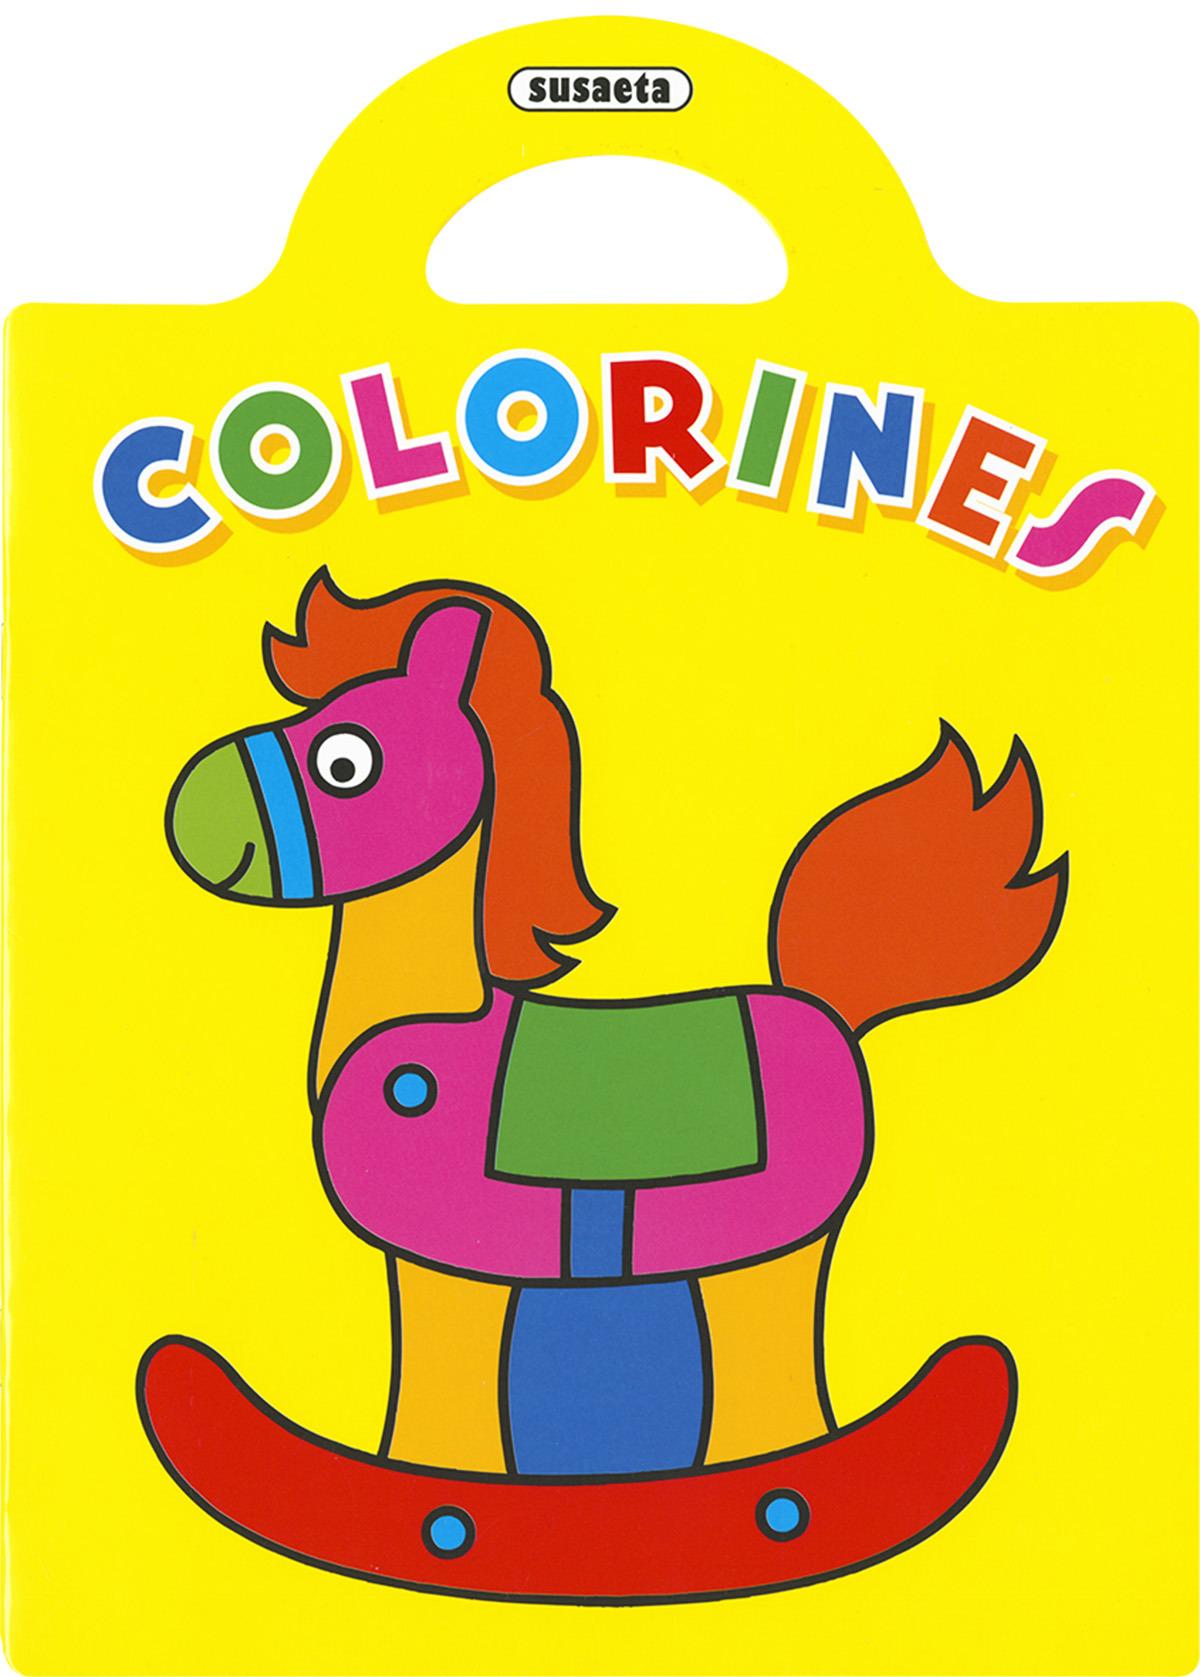 Colorines 3